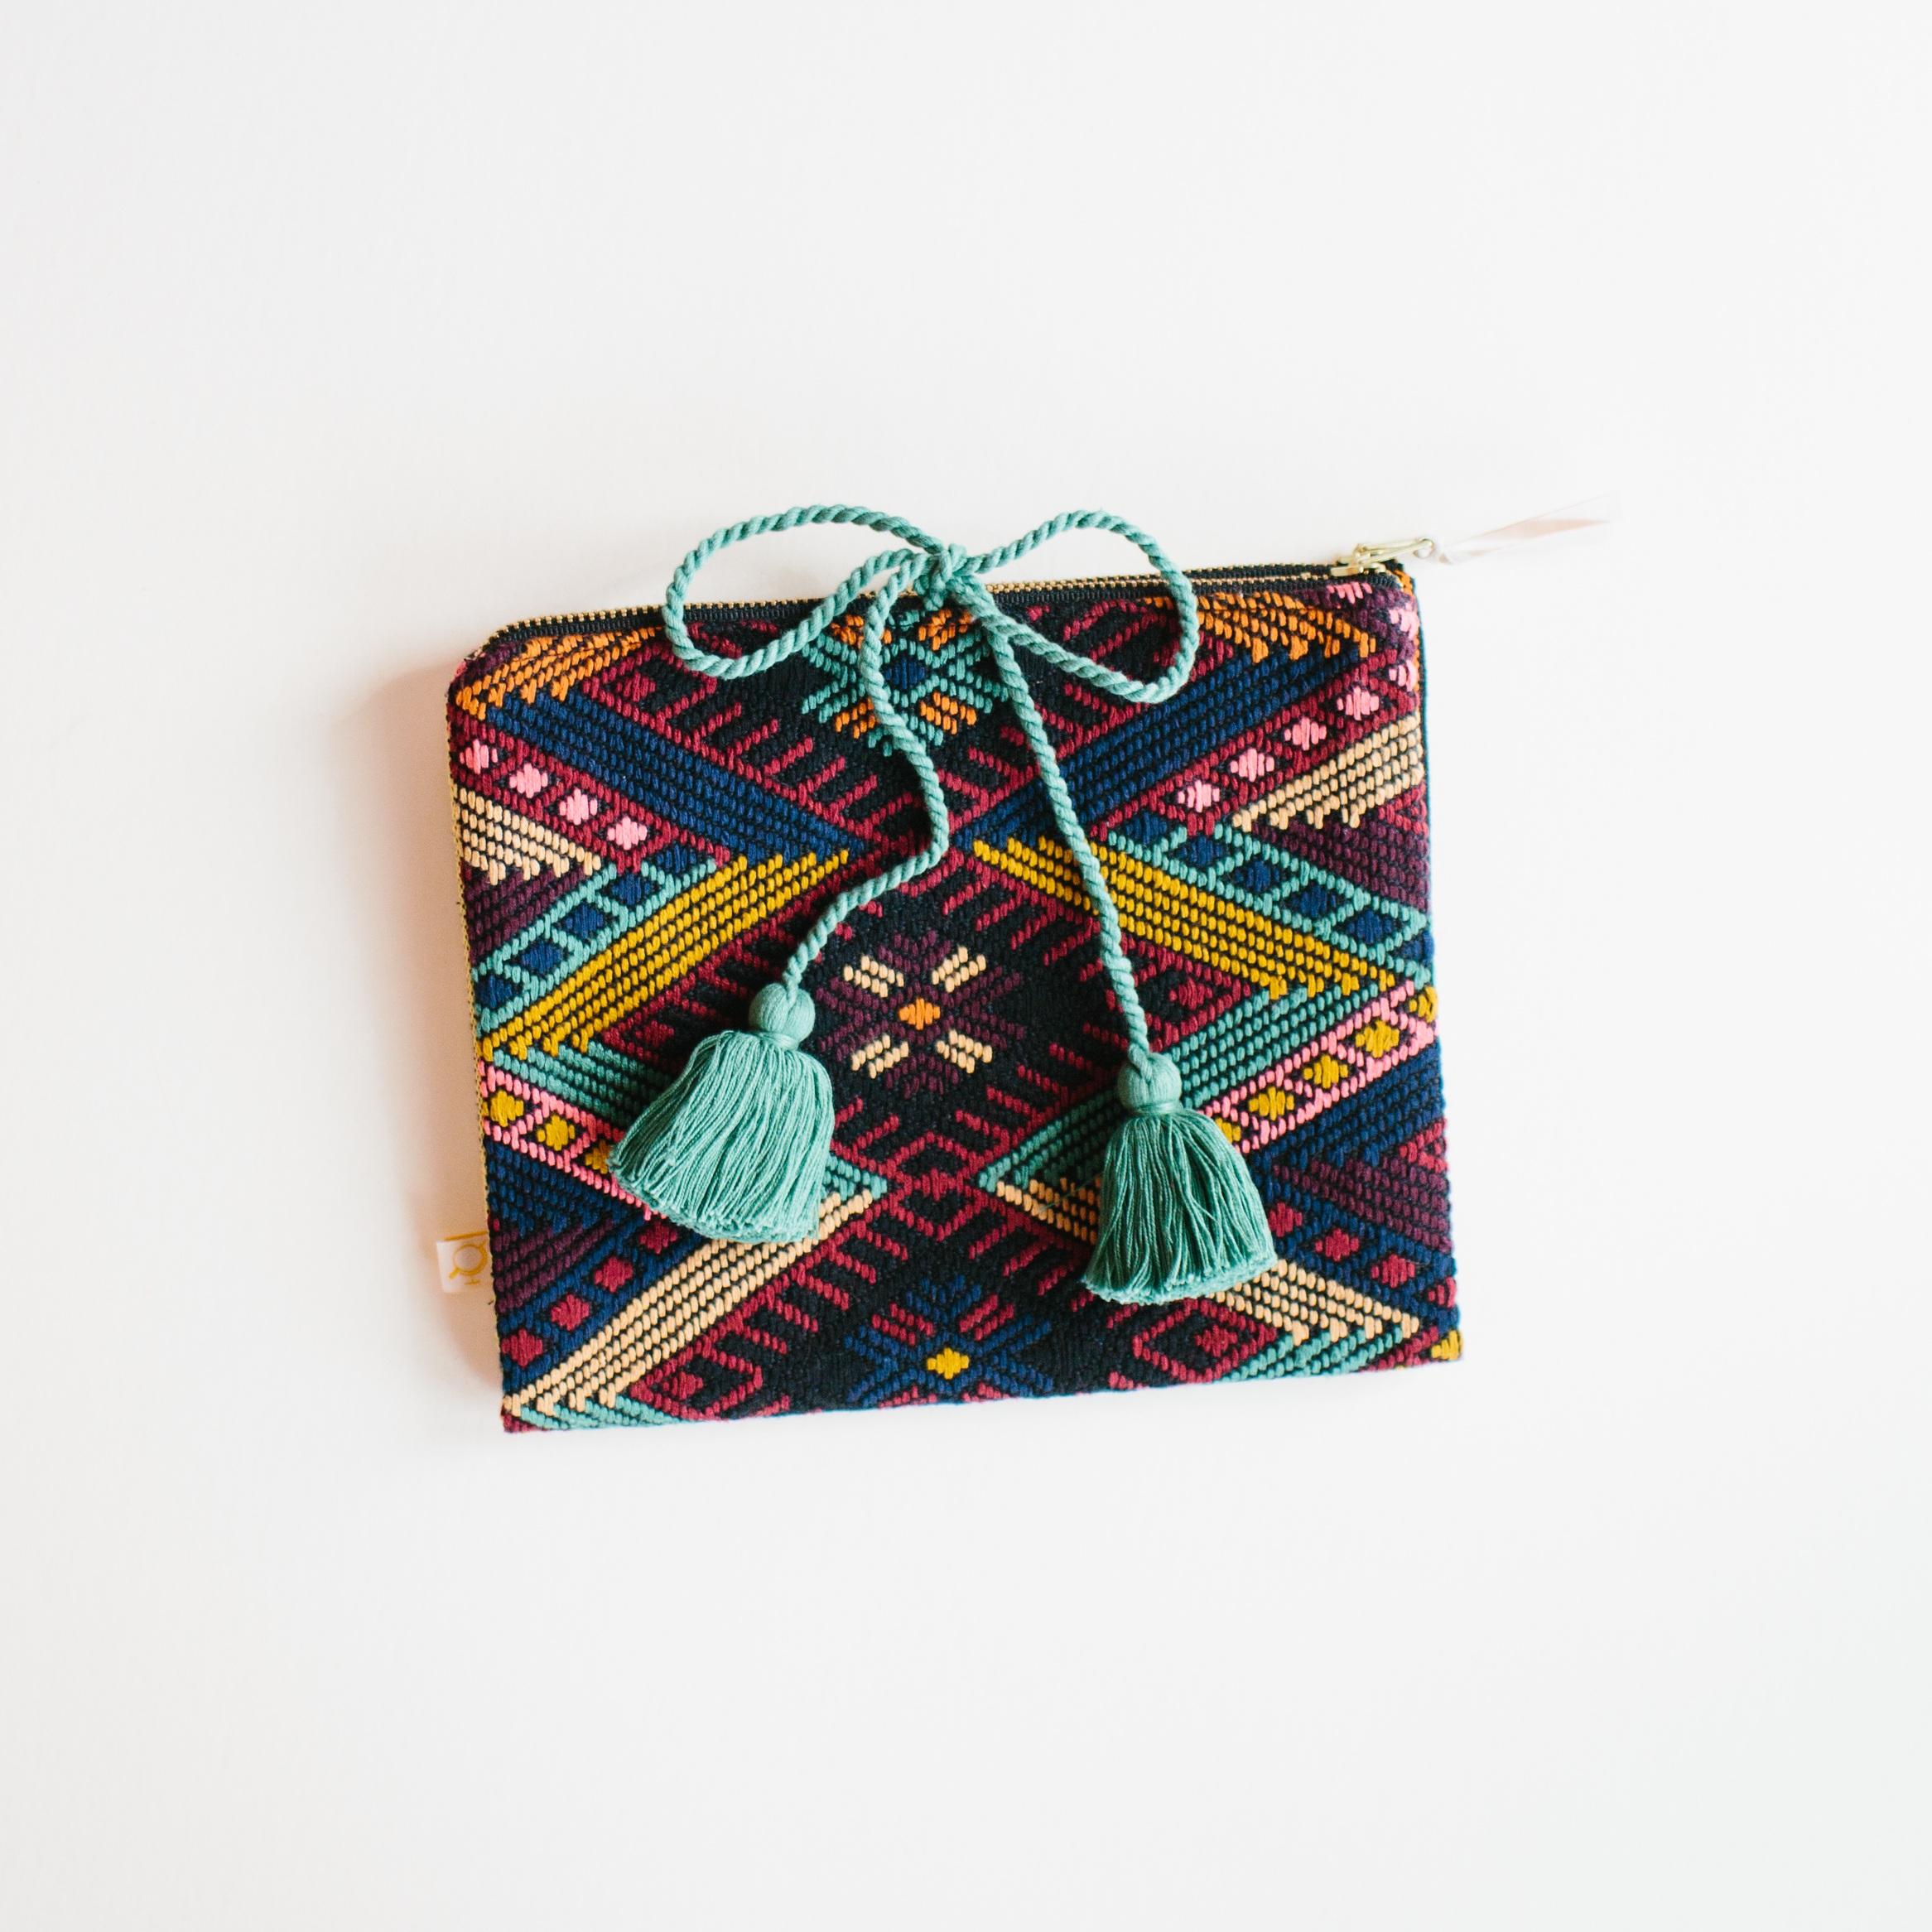 Chi-Chi Small Travel Laundry Bag